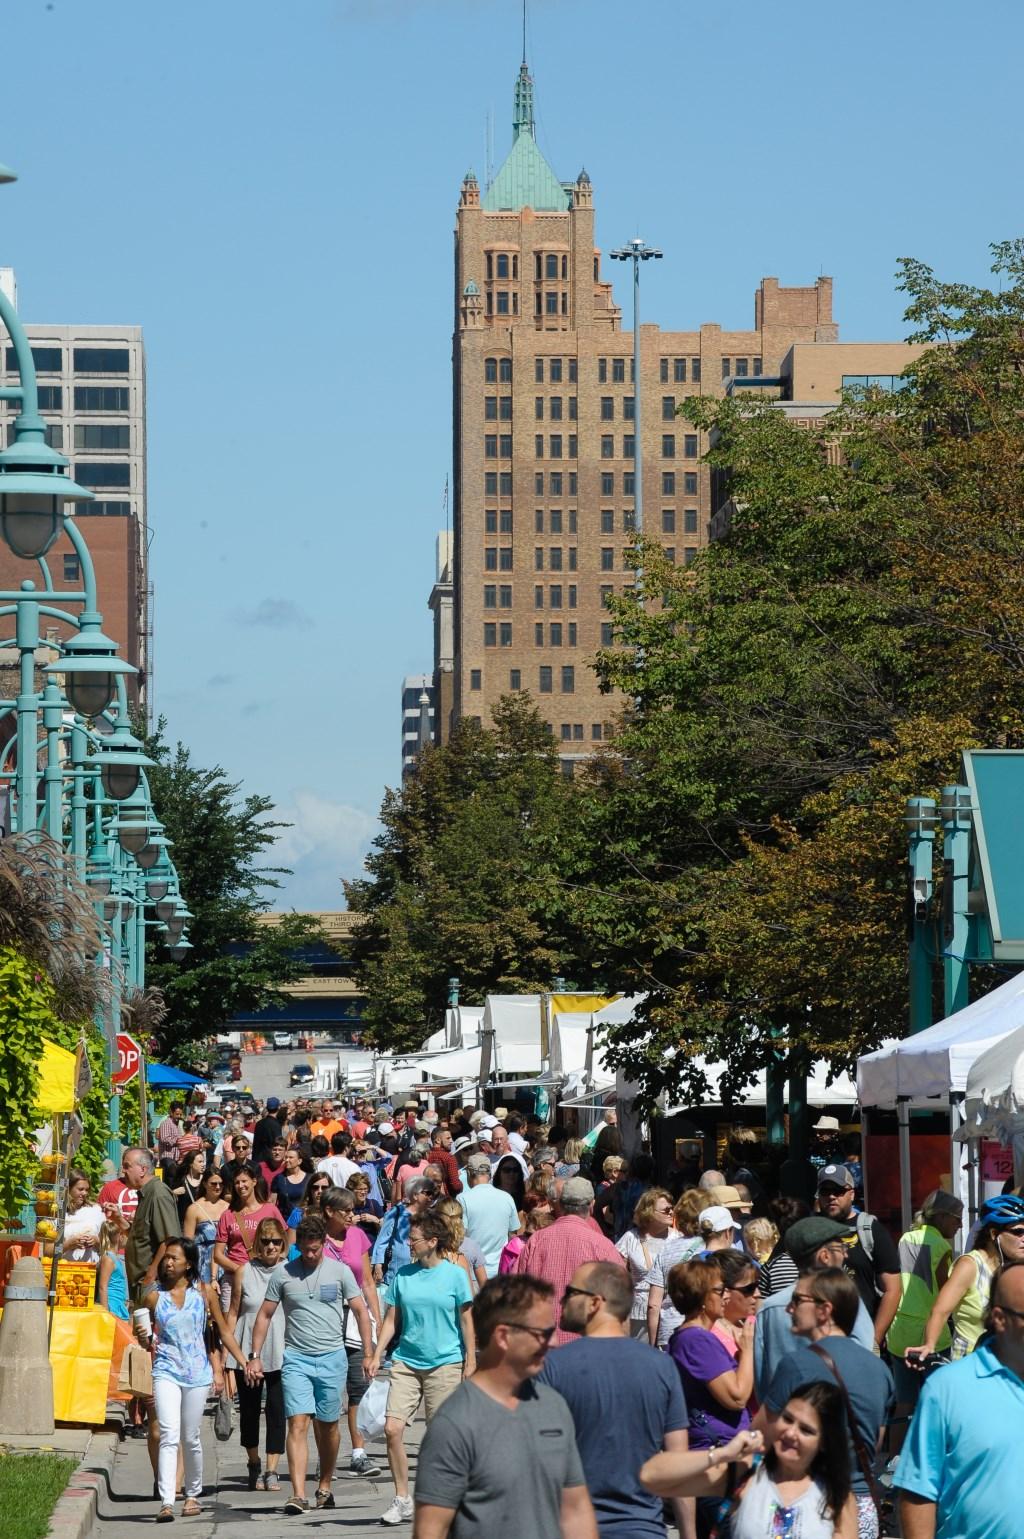 Milwaukee s third ward art festival announces call for for Craft fairs milwaukee wi